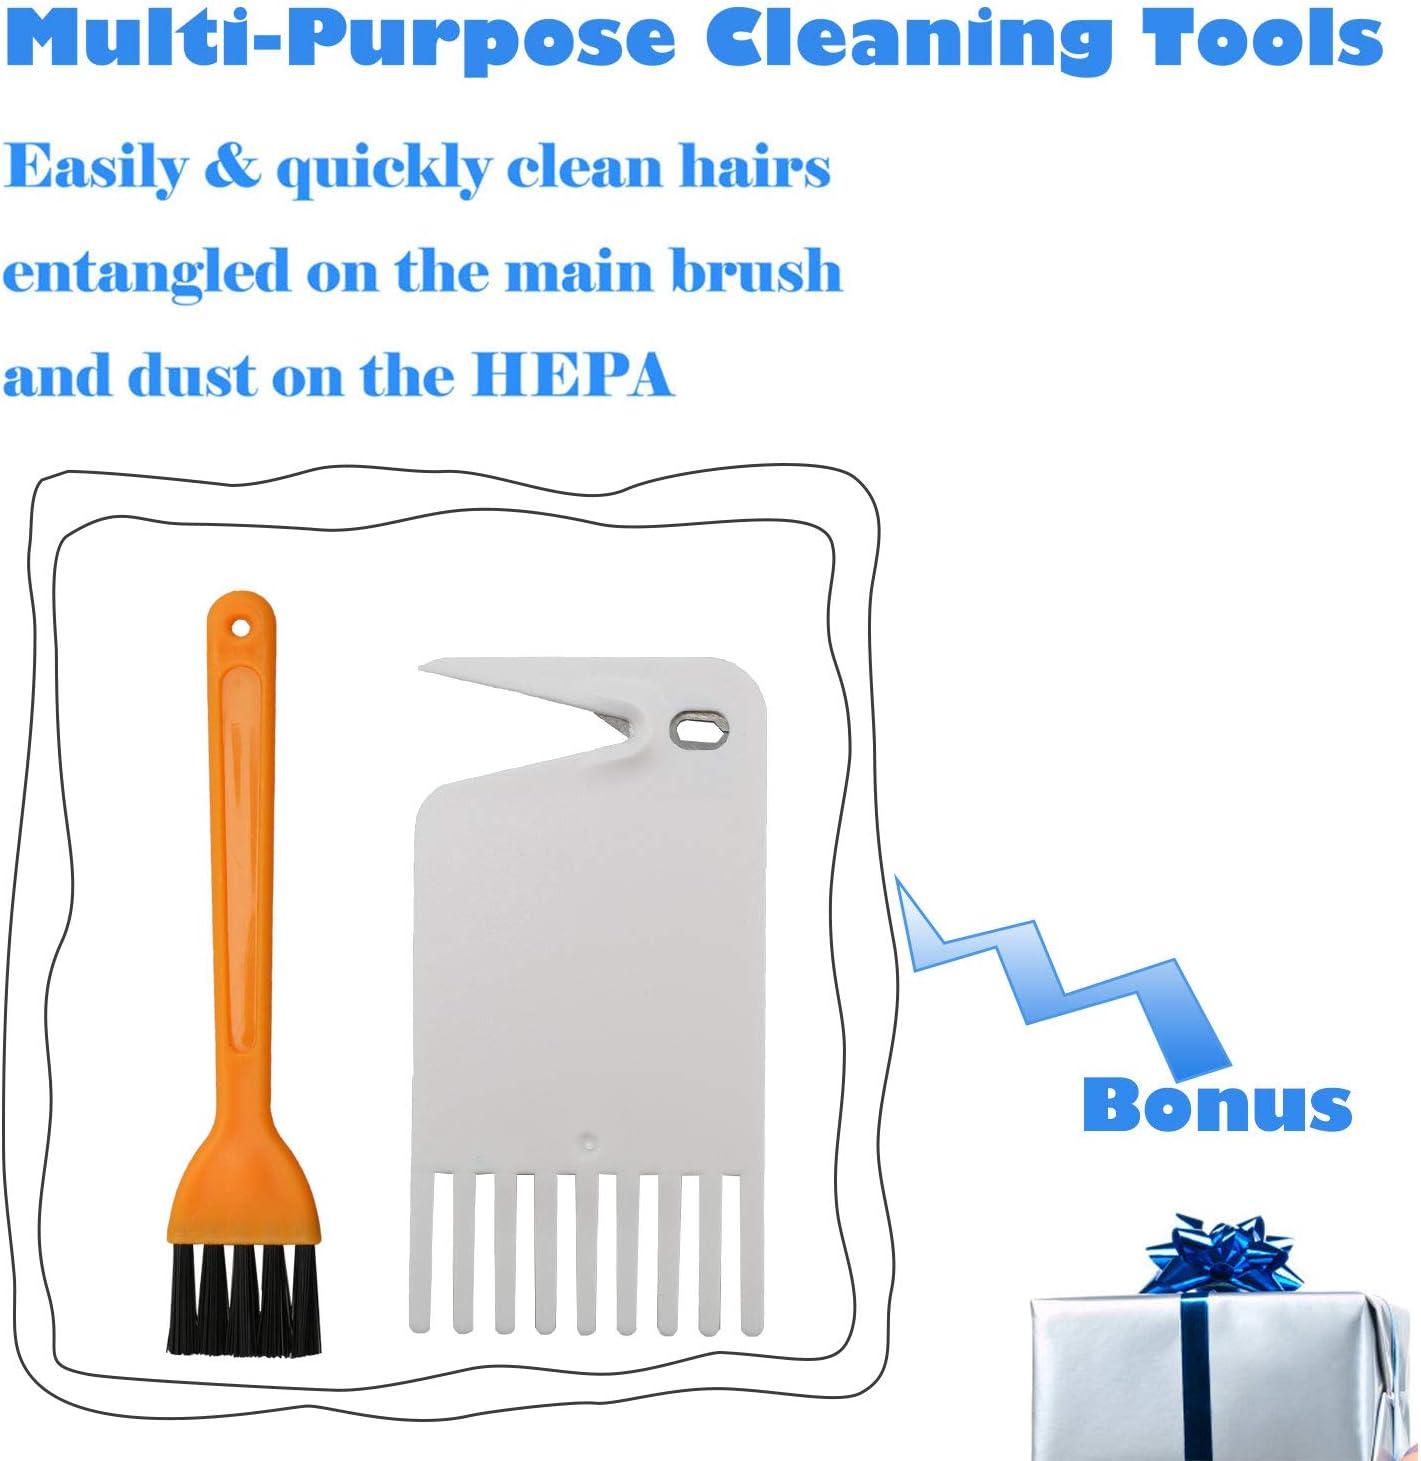 RONGJU Replacement Accessories Kit for Roborock S5 S6 E20 E25 E35 S50 Xiaomi Mi Mijia Robotic Vacuum Cleaner 4 Hepa Filter /& 2 Mop Cloth) 11 Pcs Parts(1 Main Brush 4 Side Brush